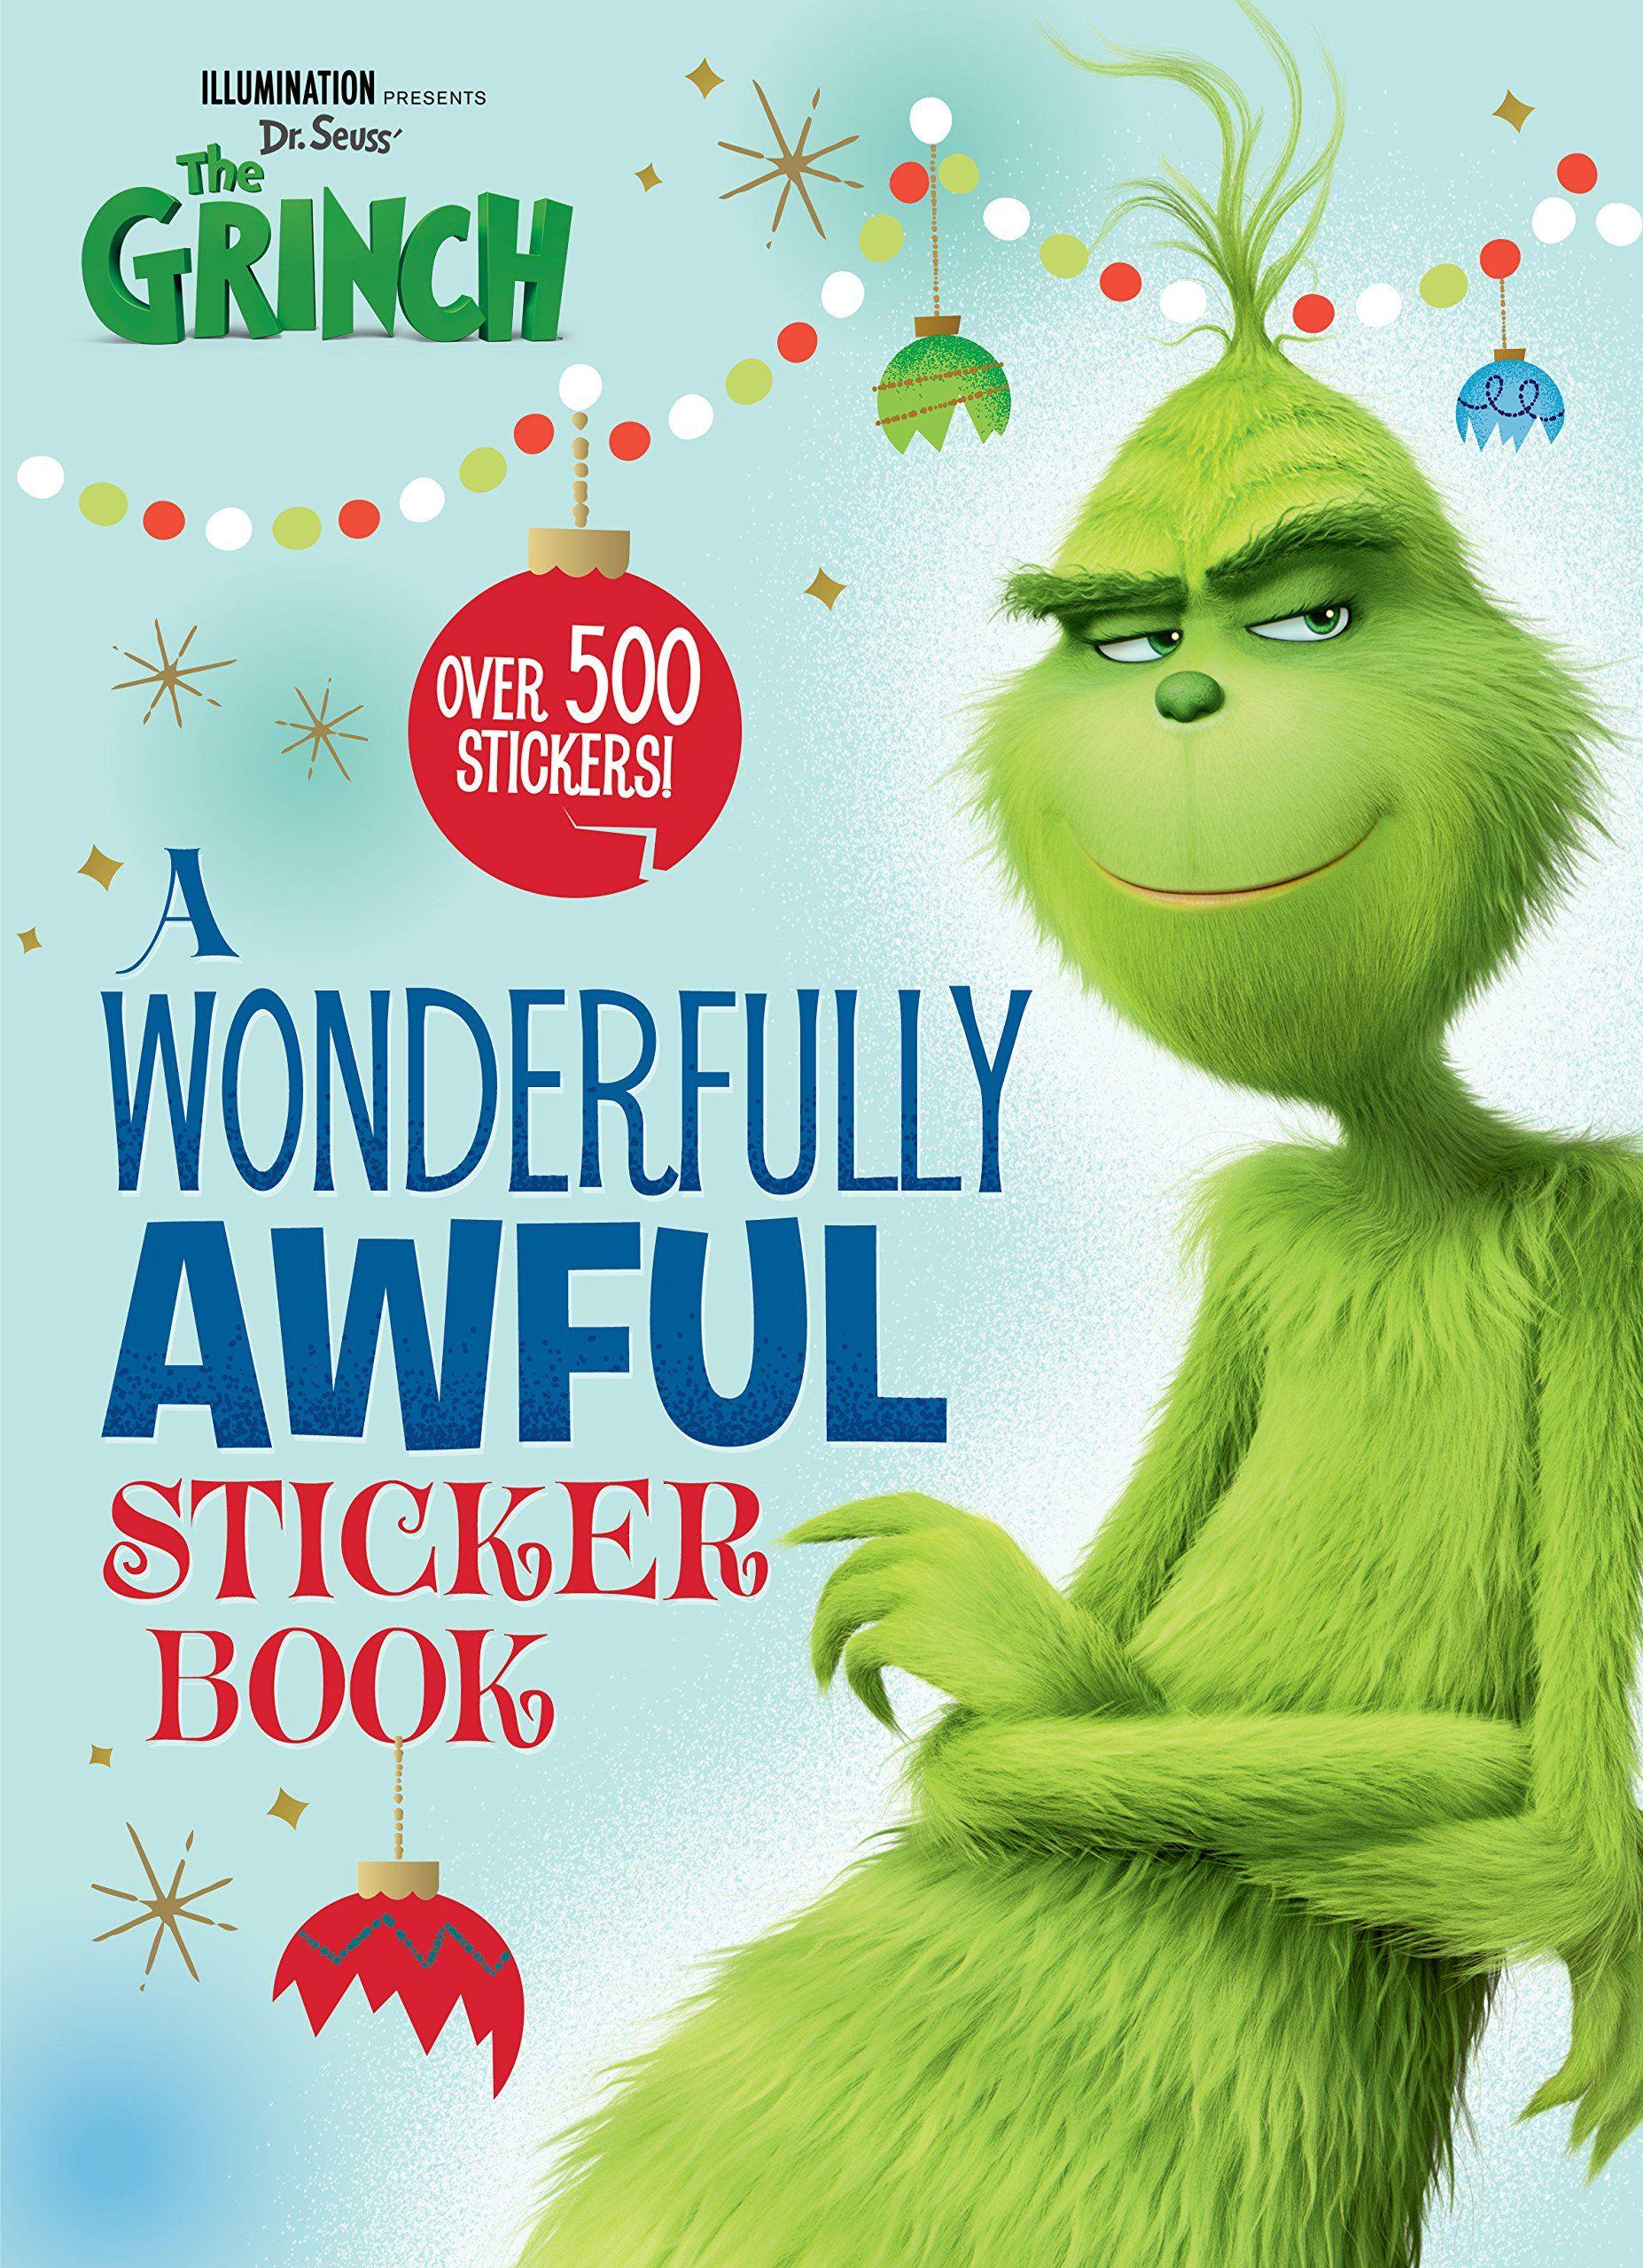 A Wonderfully Awful Sticker Book Illumination S The Grinch Illumination Presents Dr Seuss The G Sticker Book Grinch Watch The Grinch